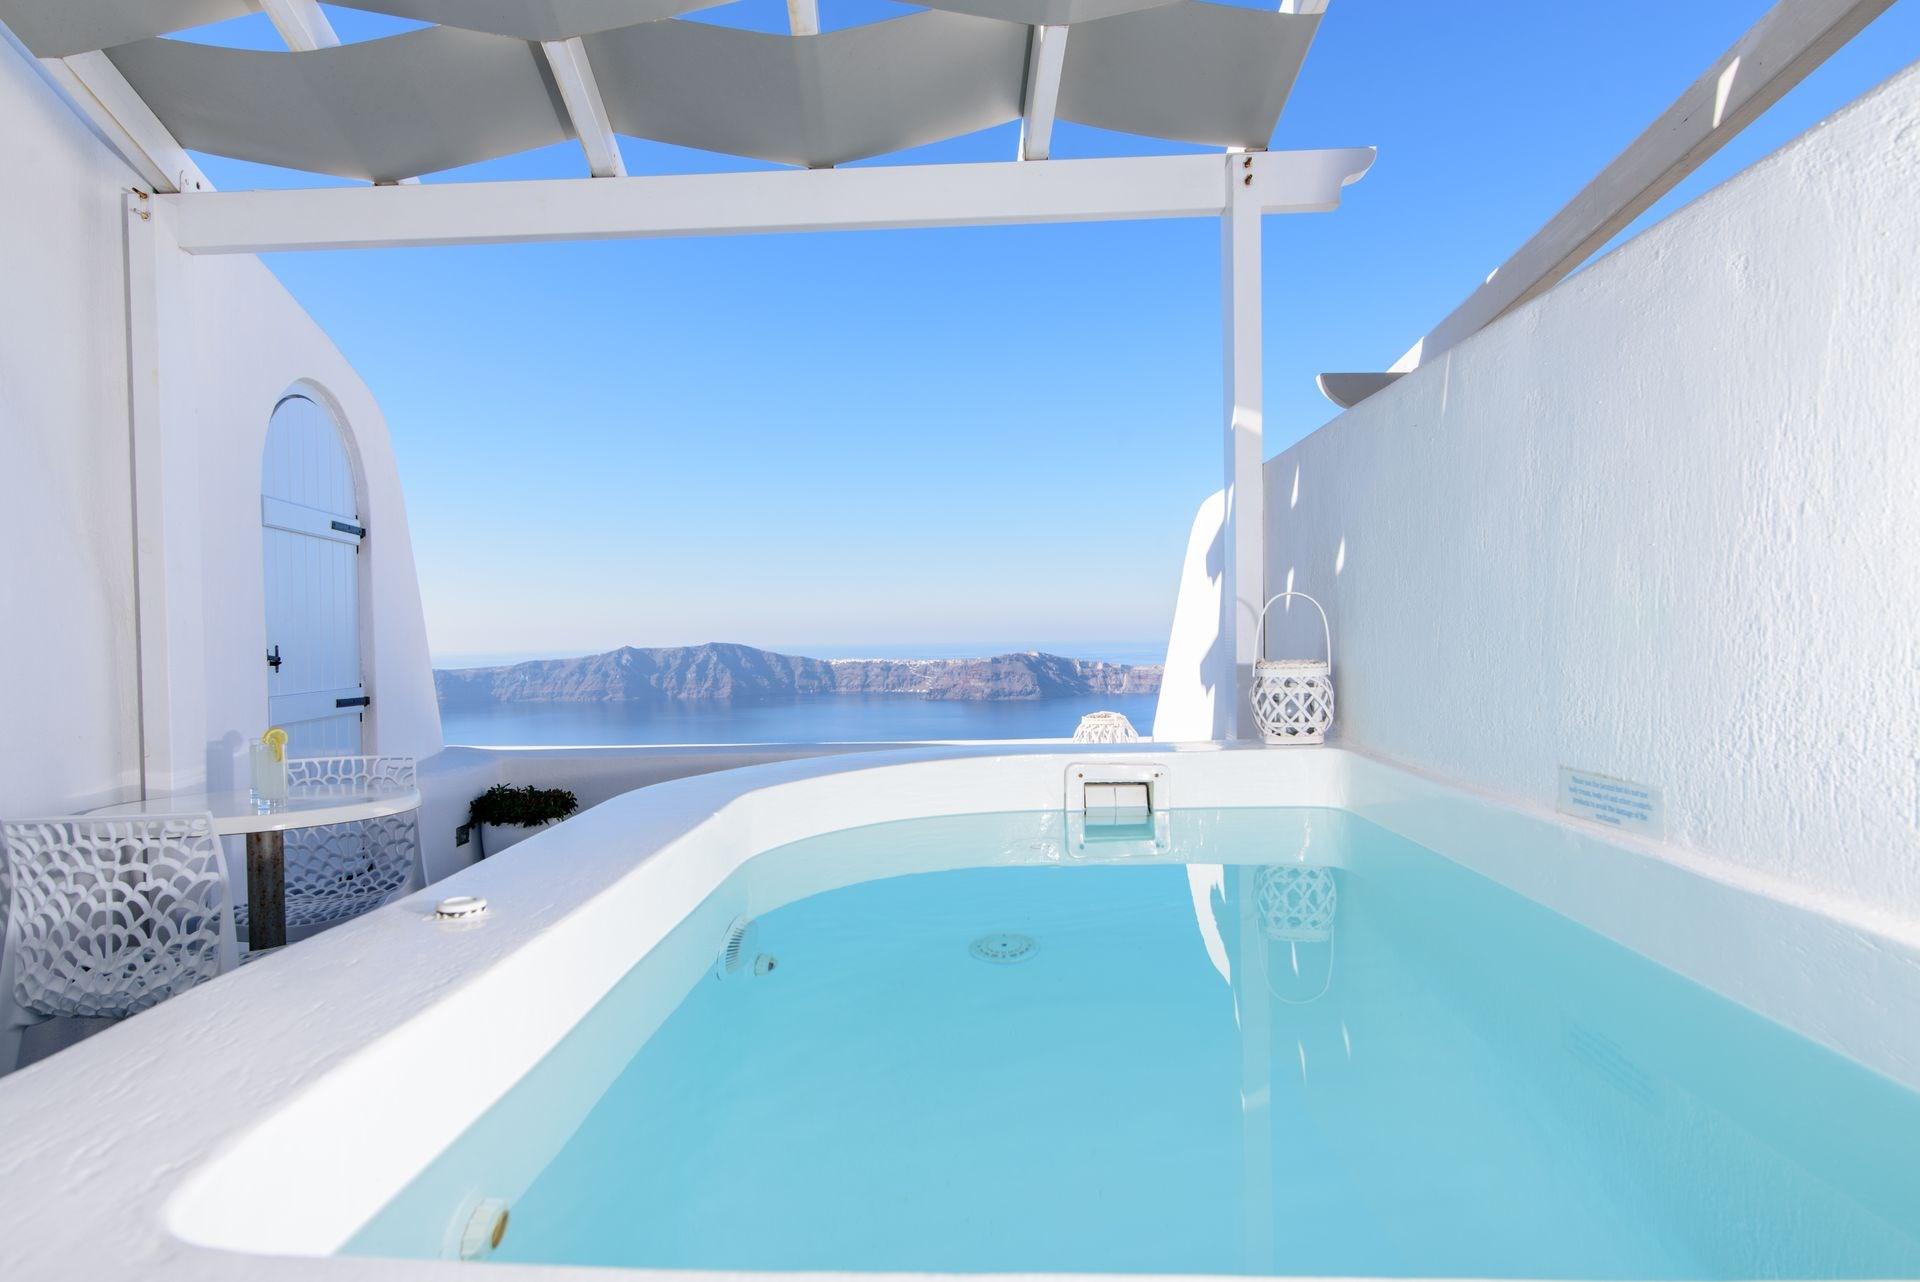 Dreaming View Suites Hotels In Imerovigli Caldera Aerial